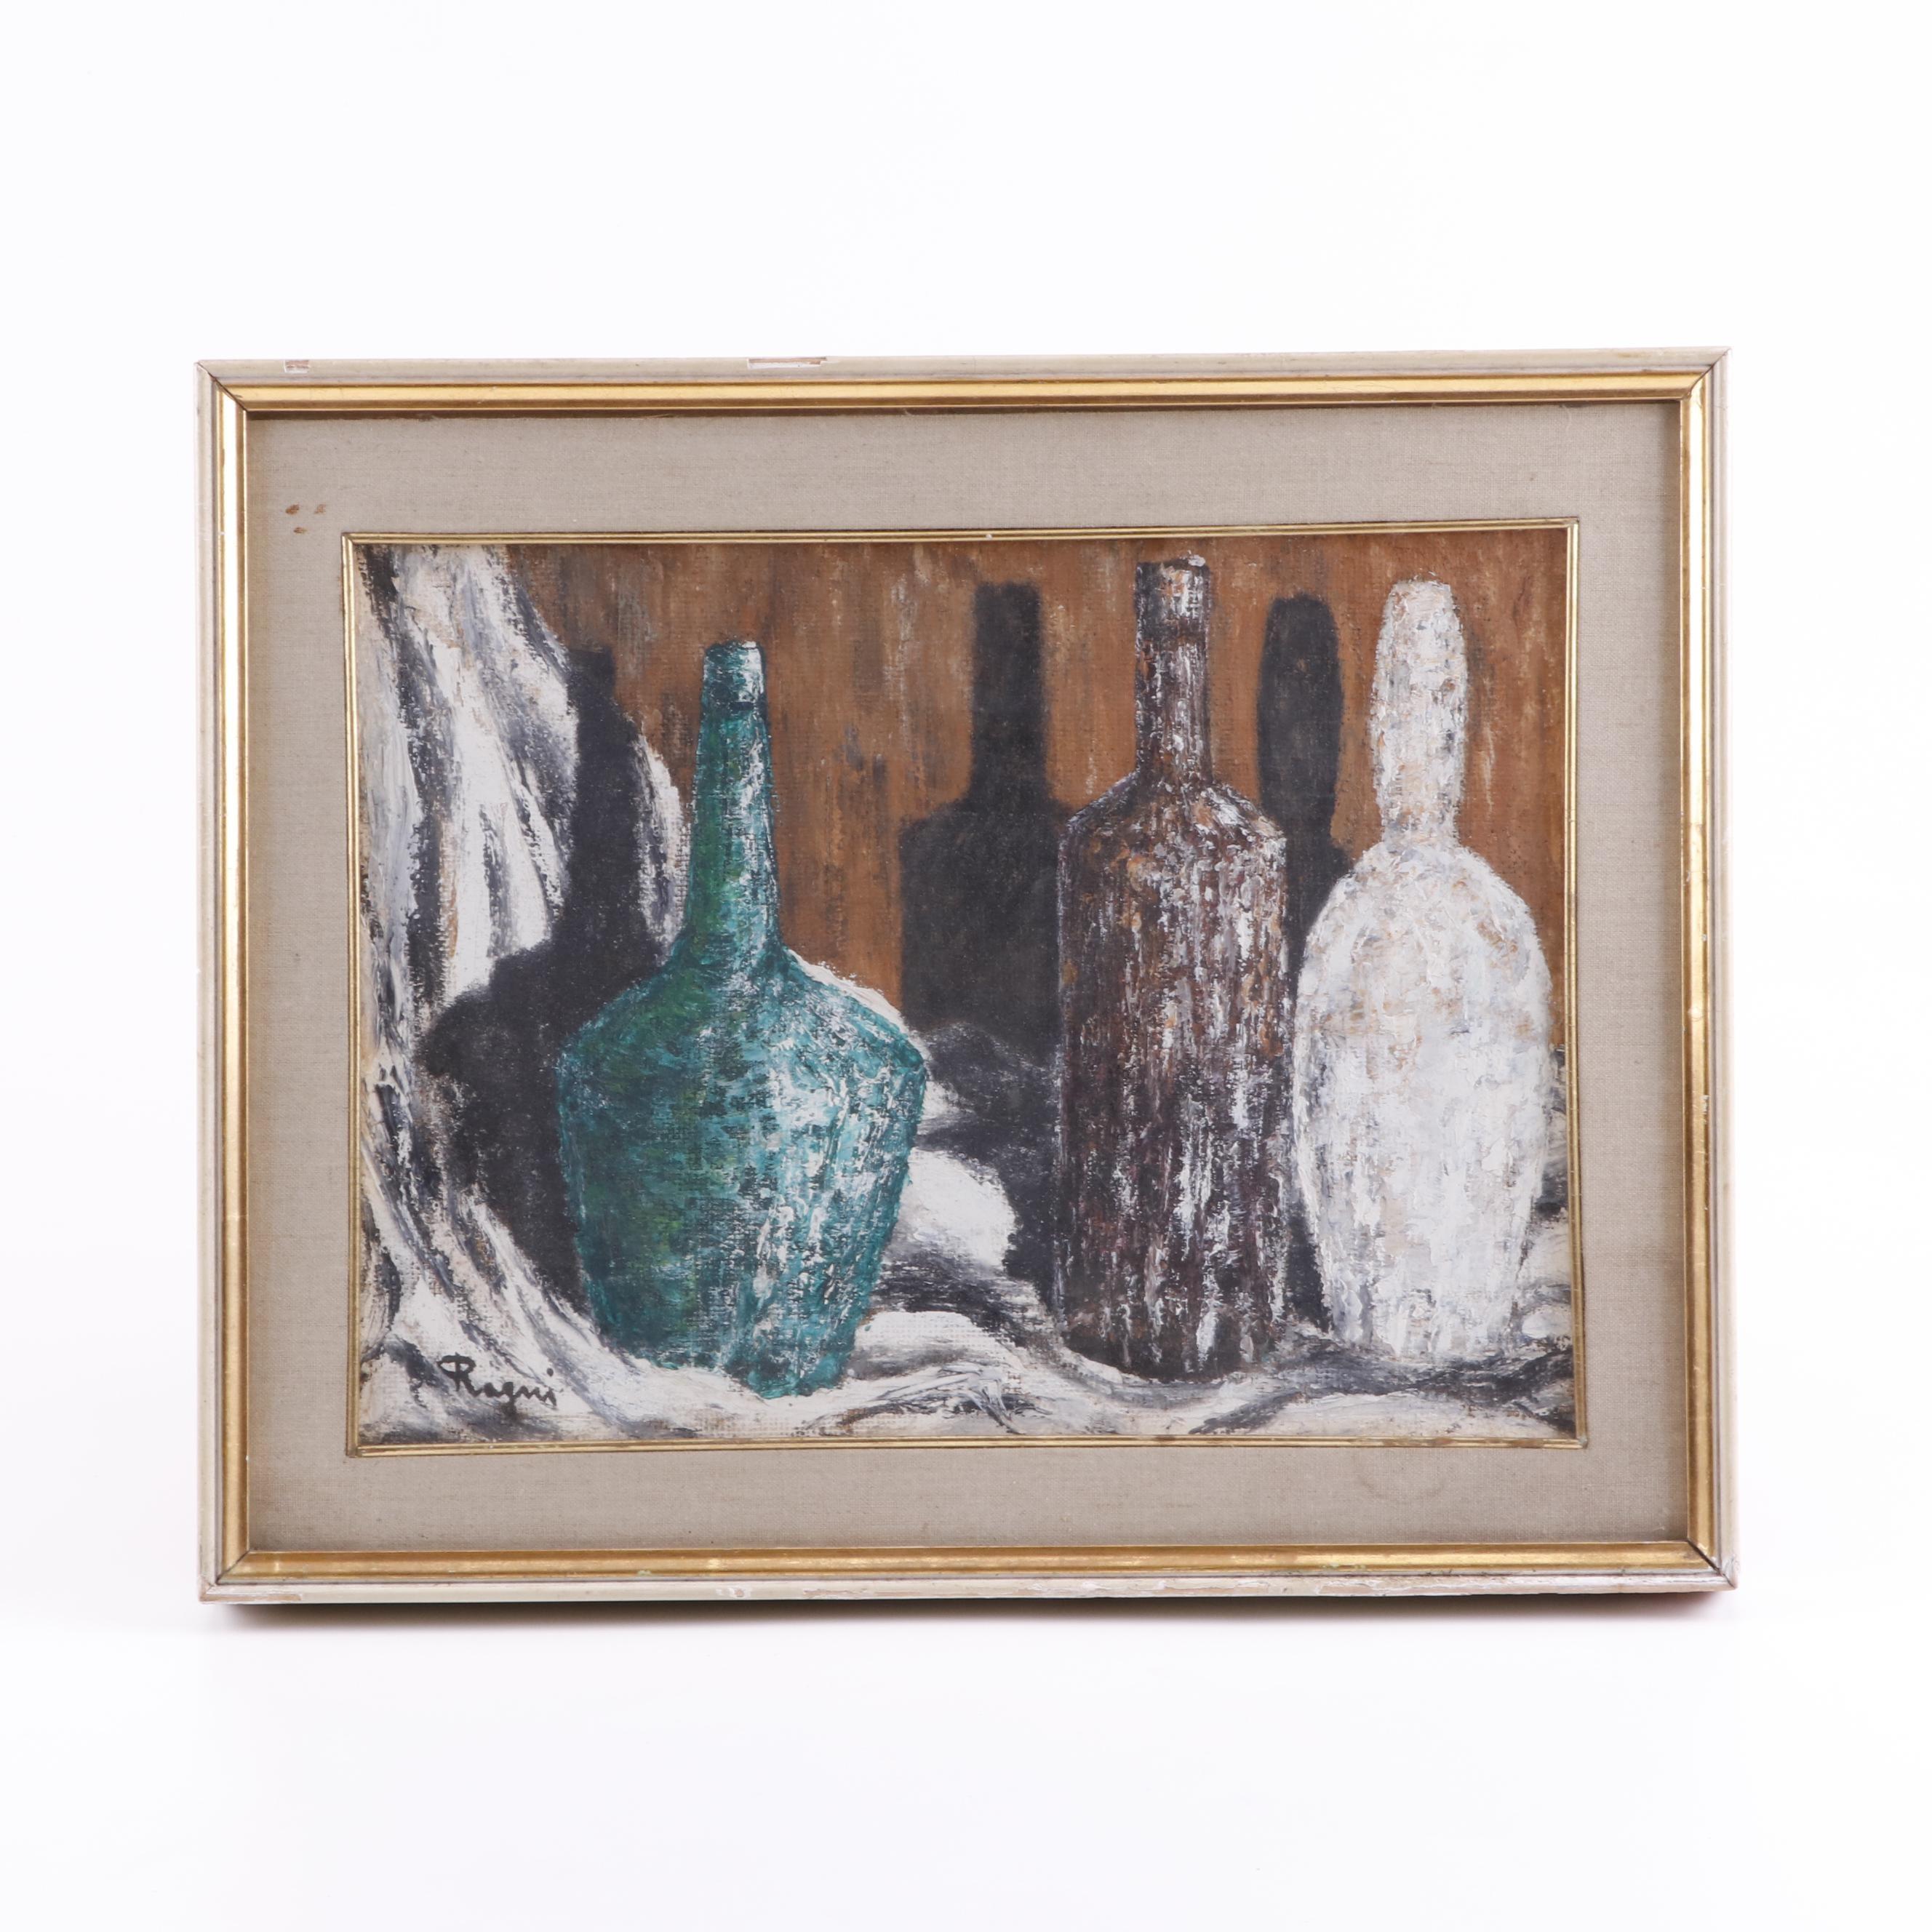 Basso Ragni Still Life Painting